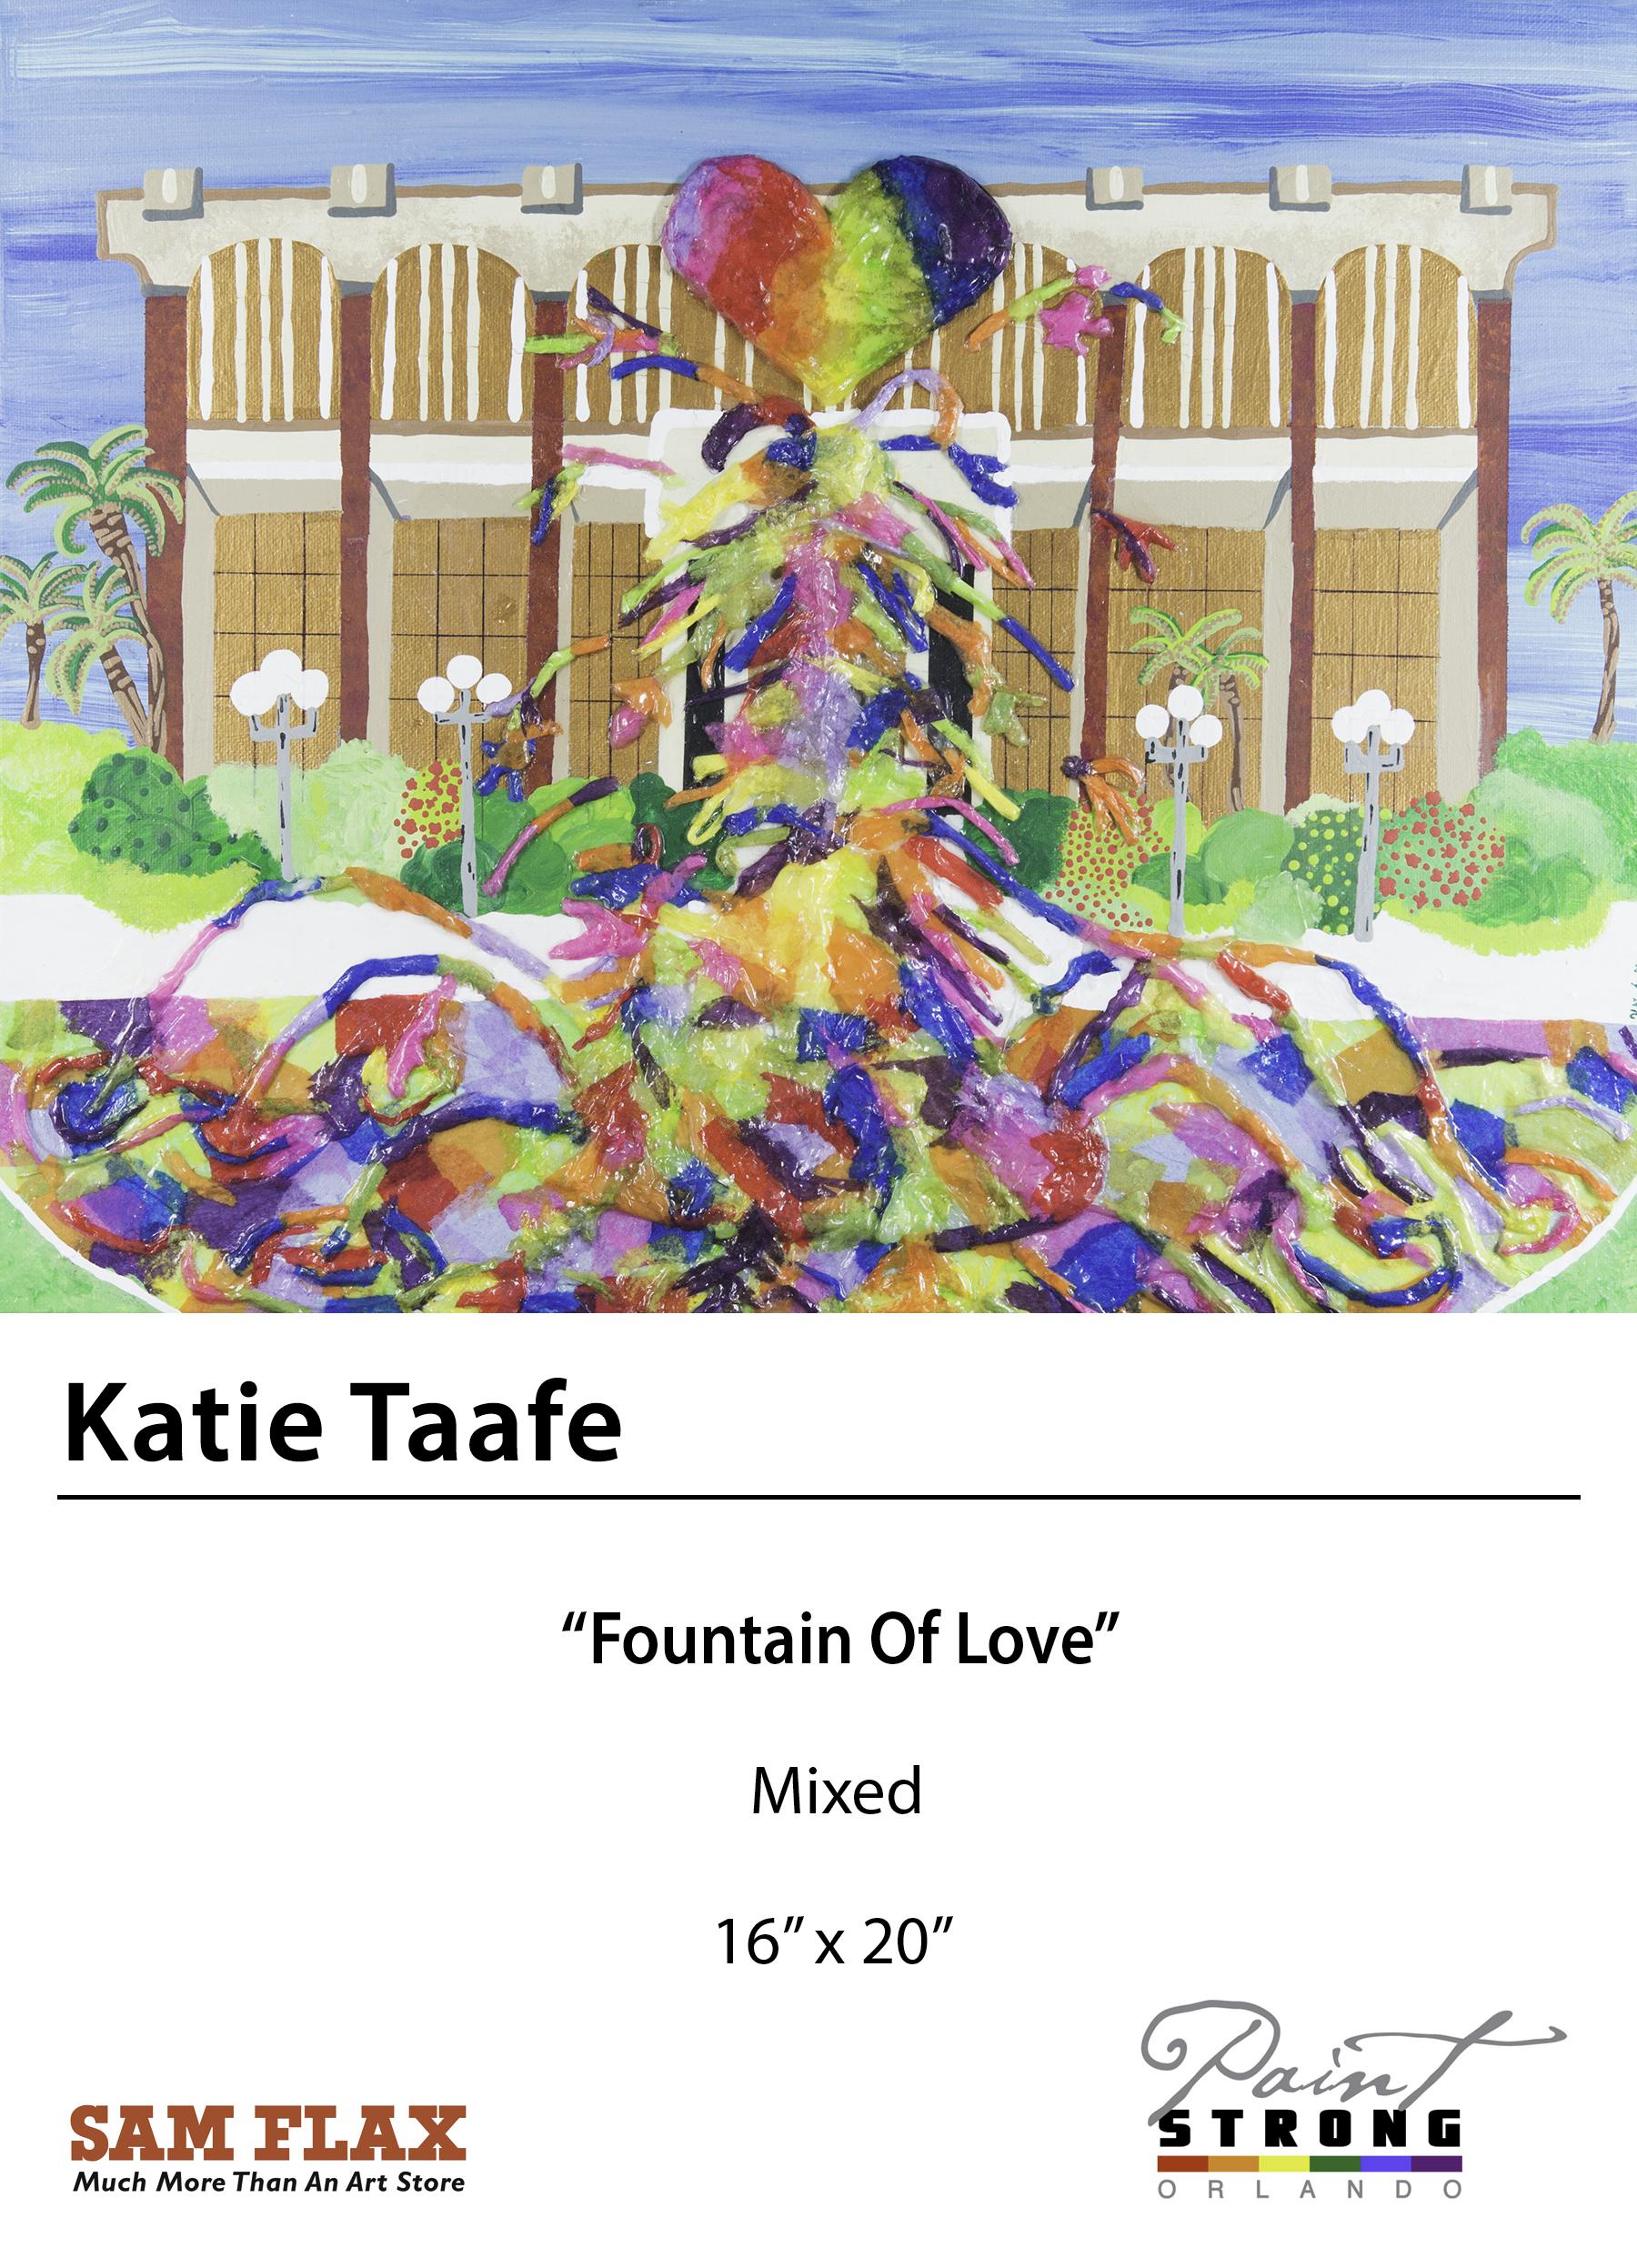 Katie Taafe